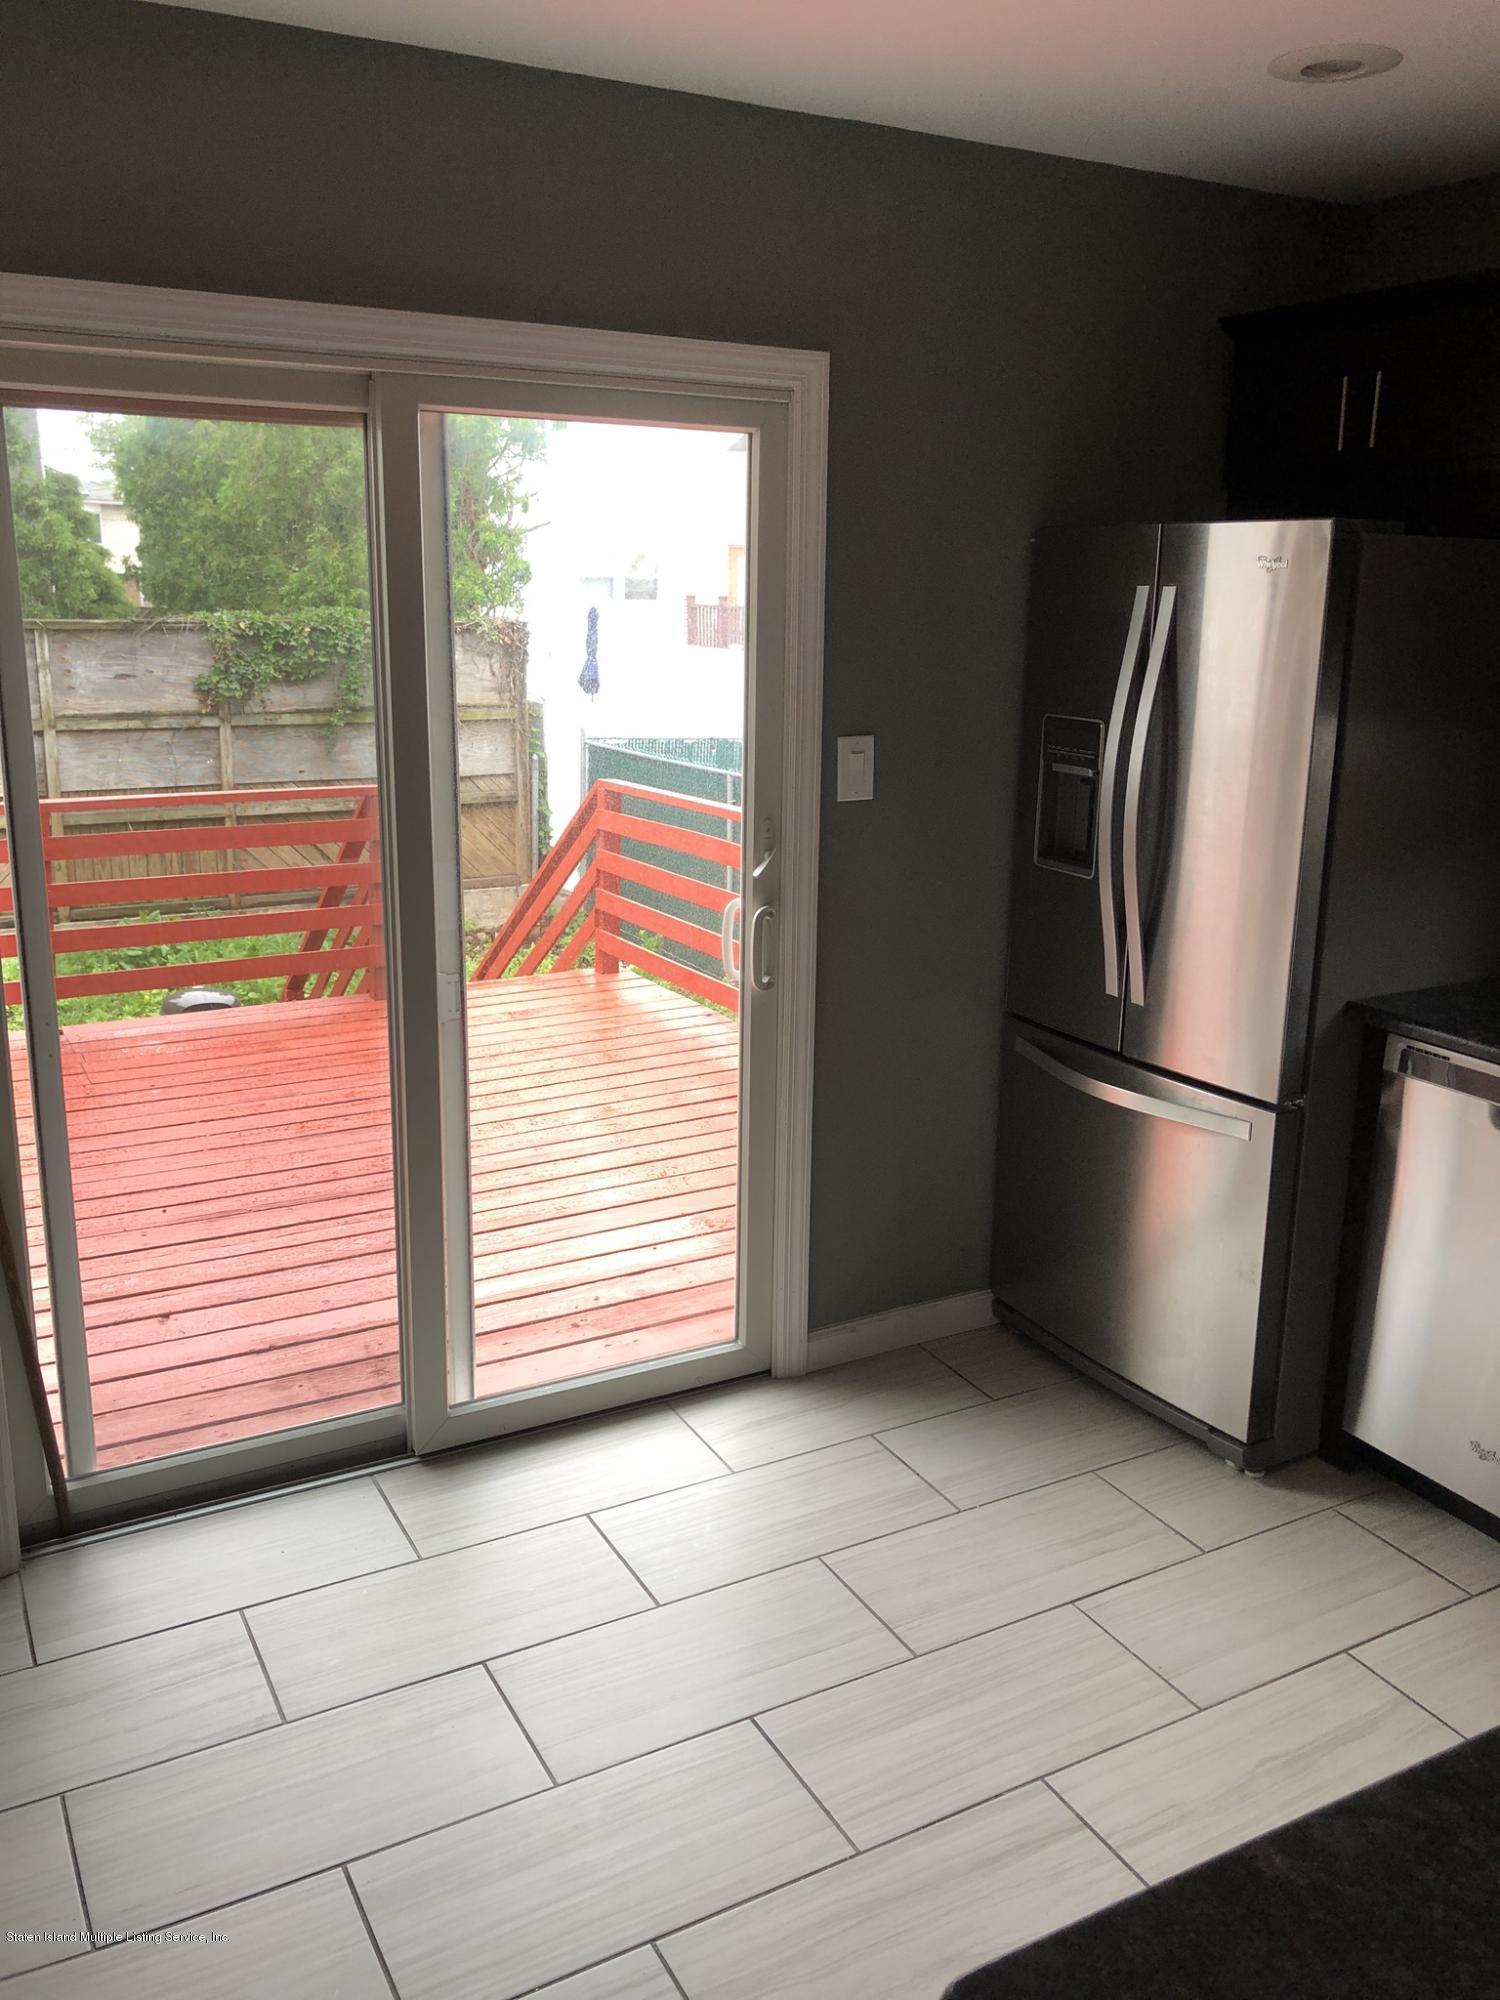 Single Family - Semi-Attached 59 Cranford Street  Staten Island, NY 10308, MLS-1128460-18